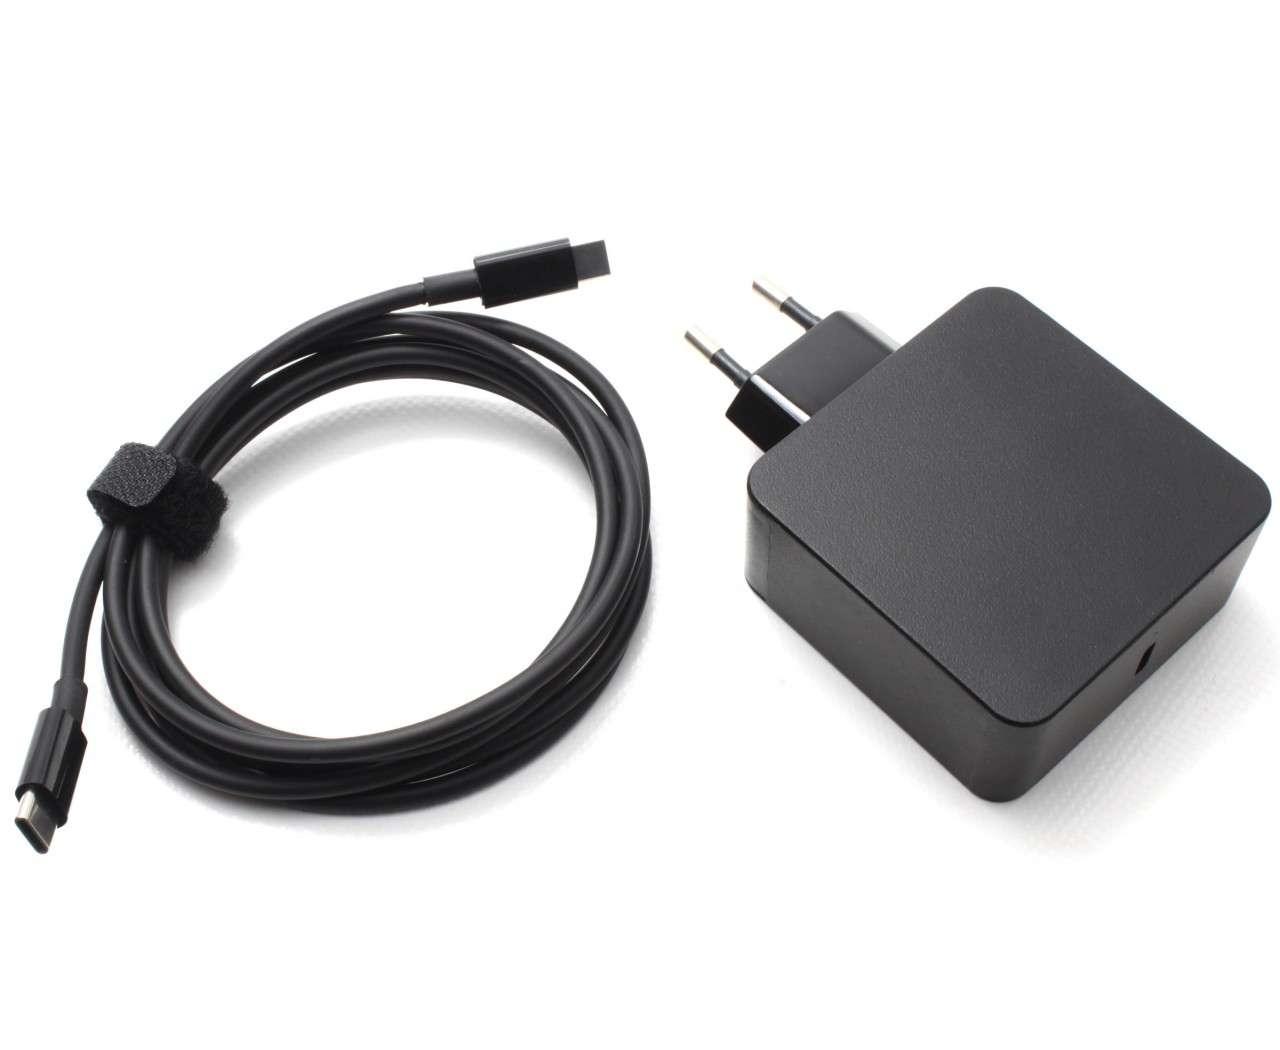 Incarcator HP Spectre X560 Convertible 13-ae513TU 65W imagine powerlaptop.ro 2021